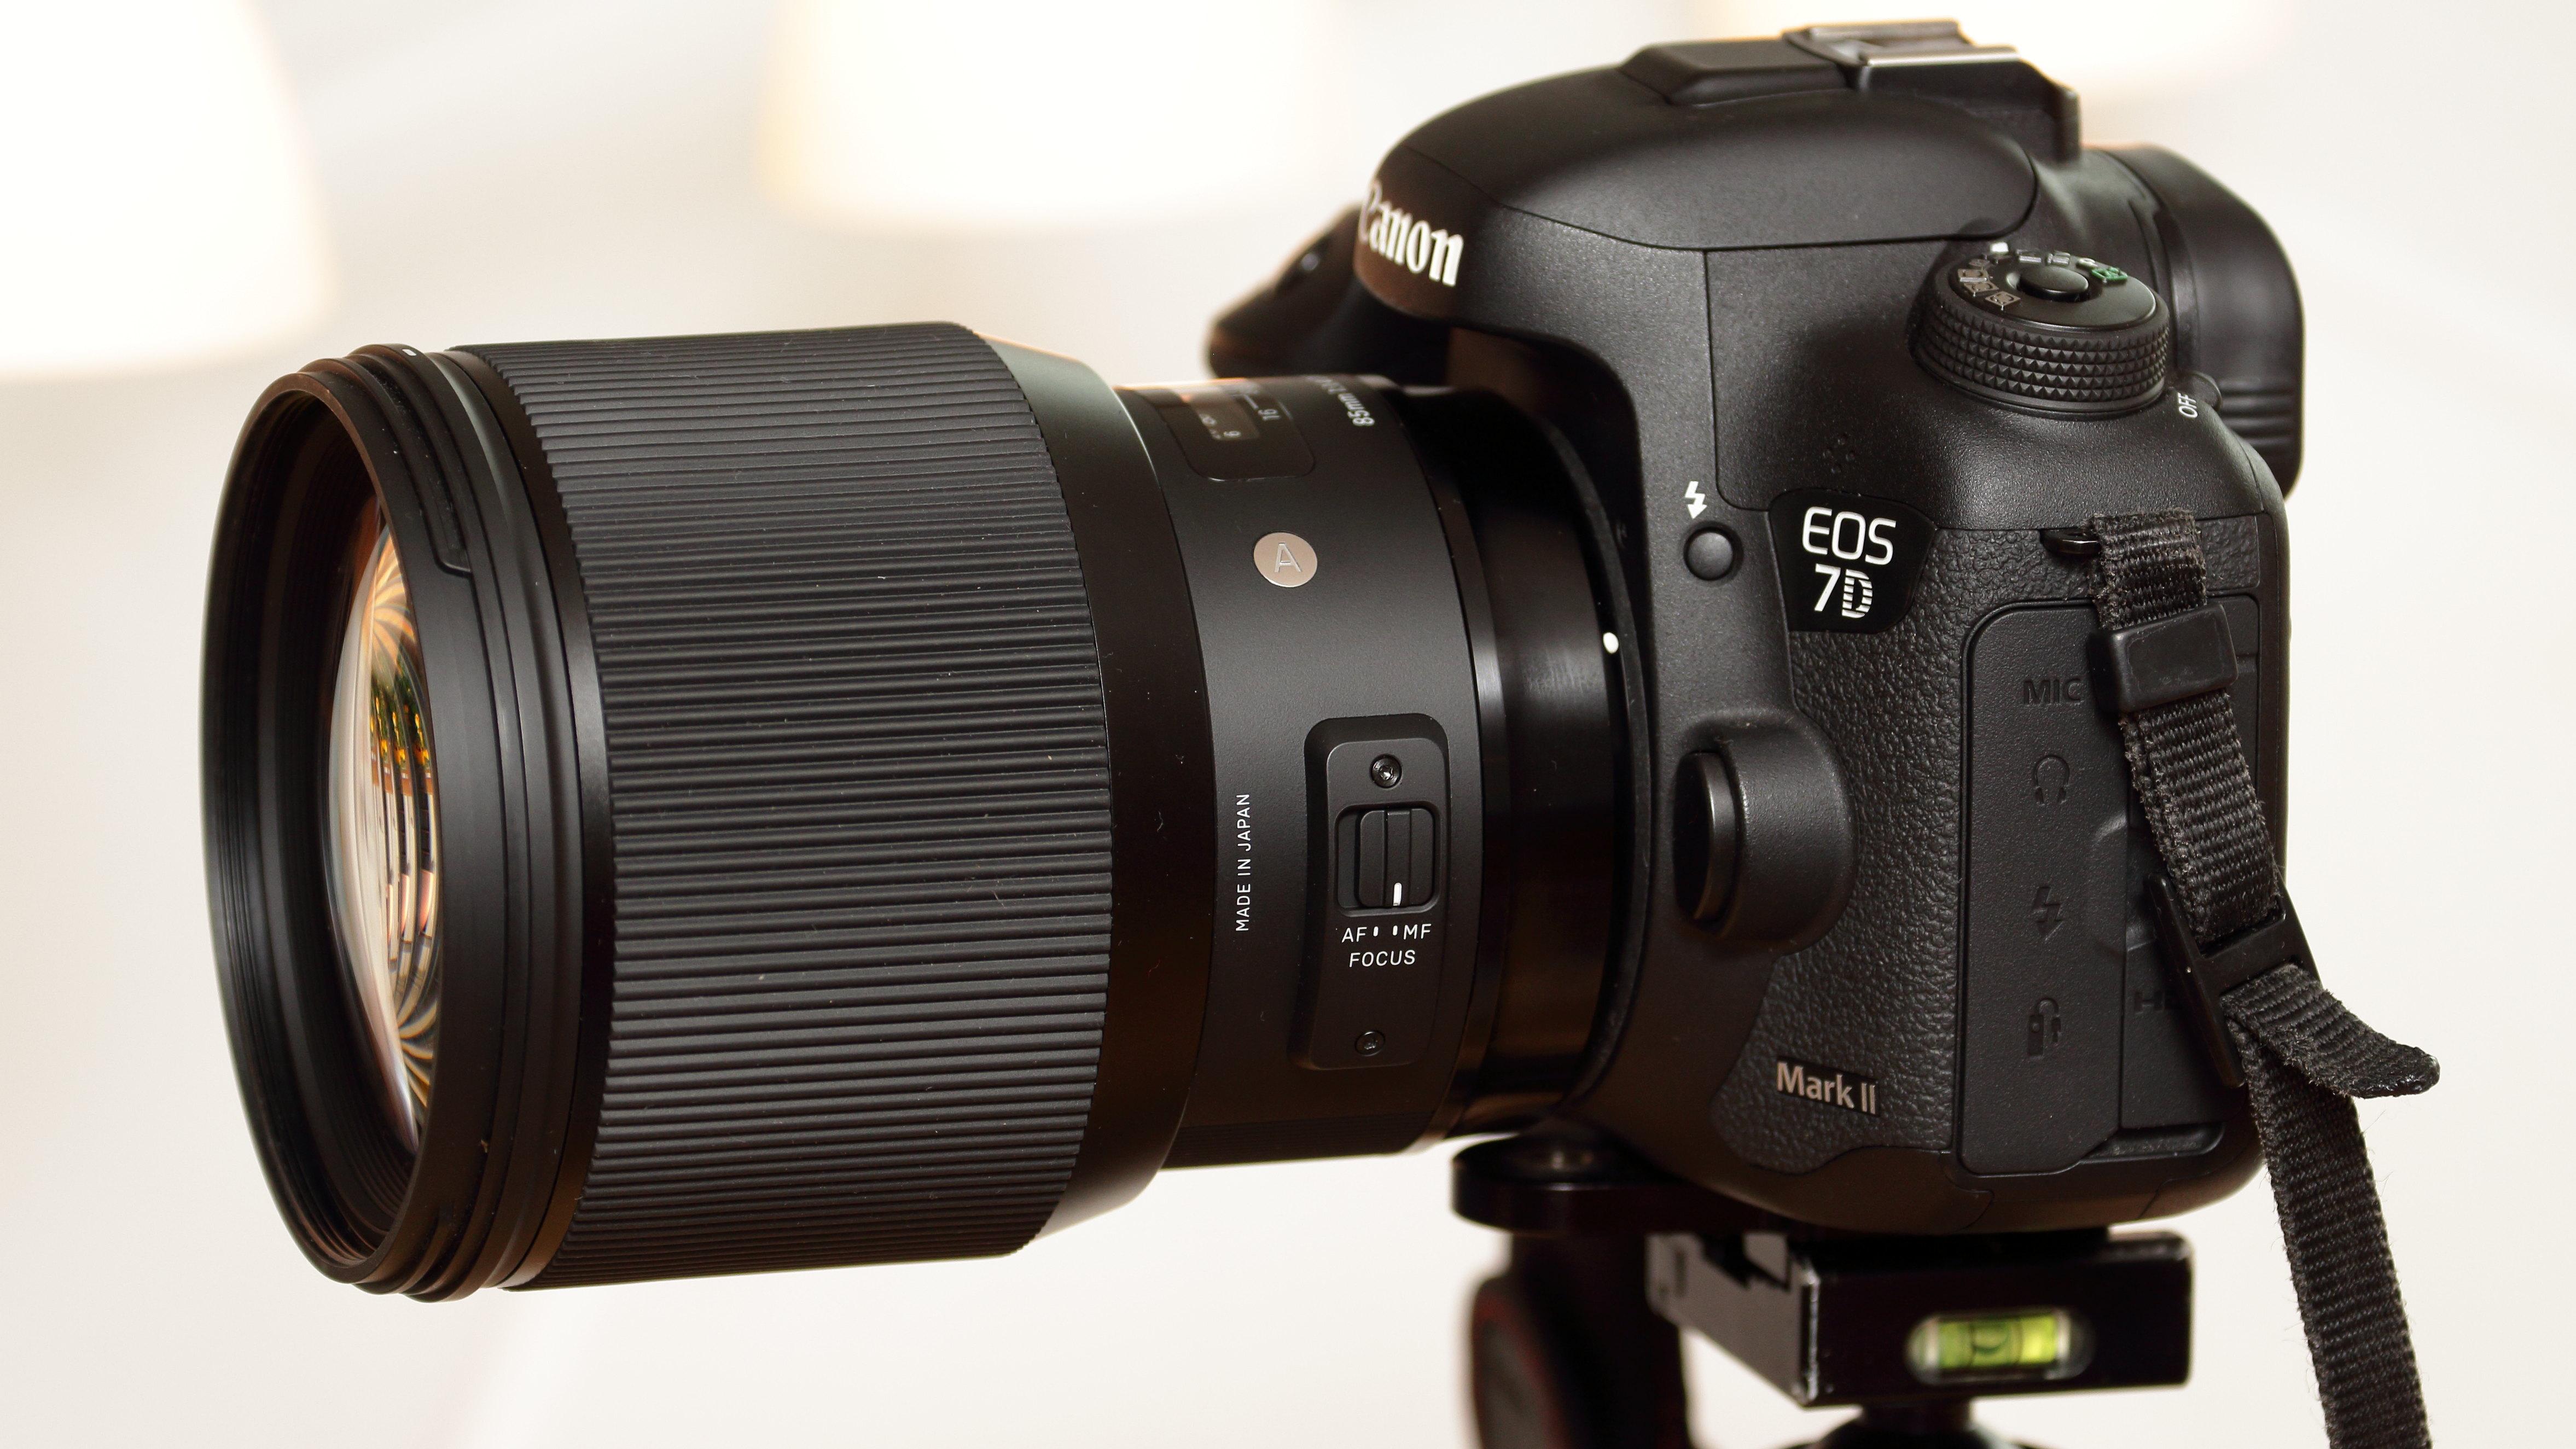 Canon EOS 7D Mark II – Wikipedia